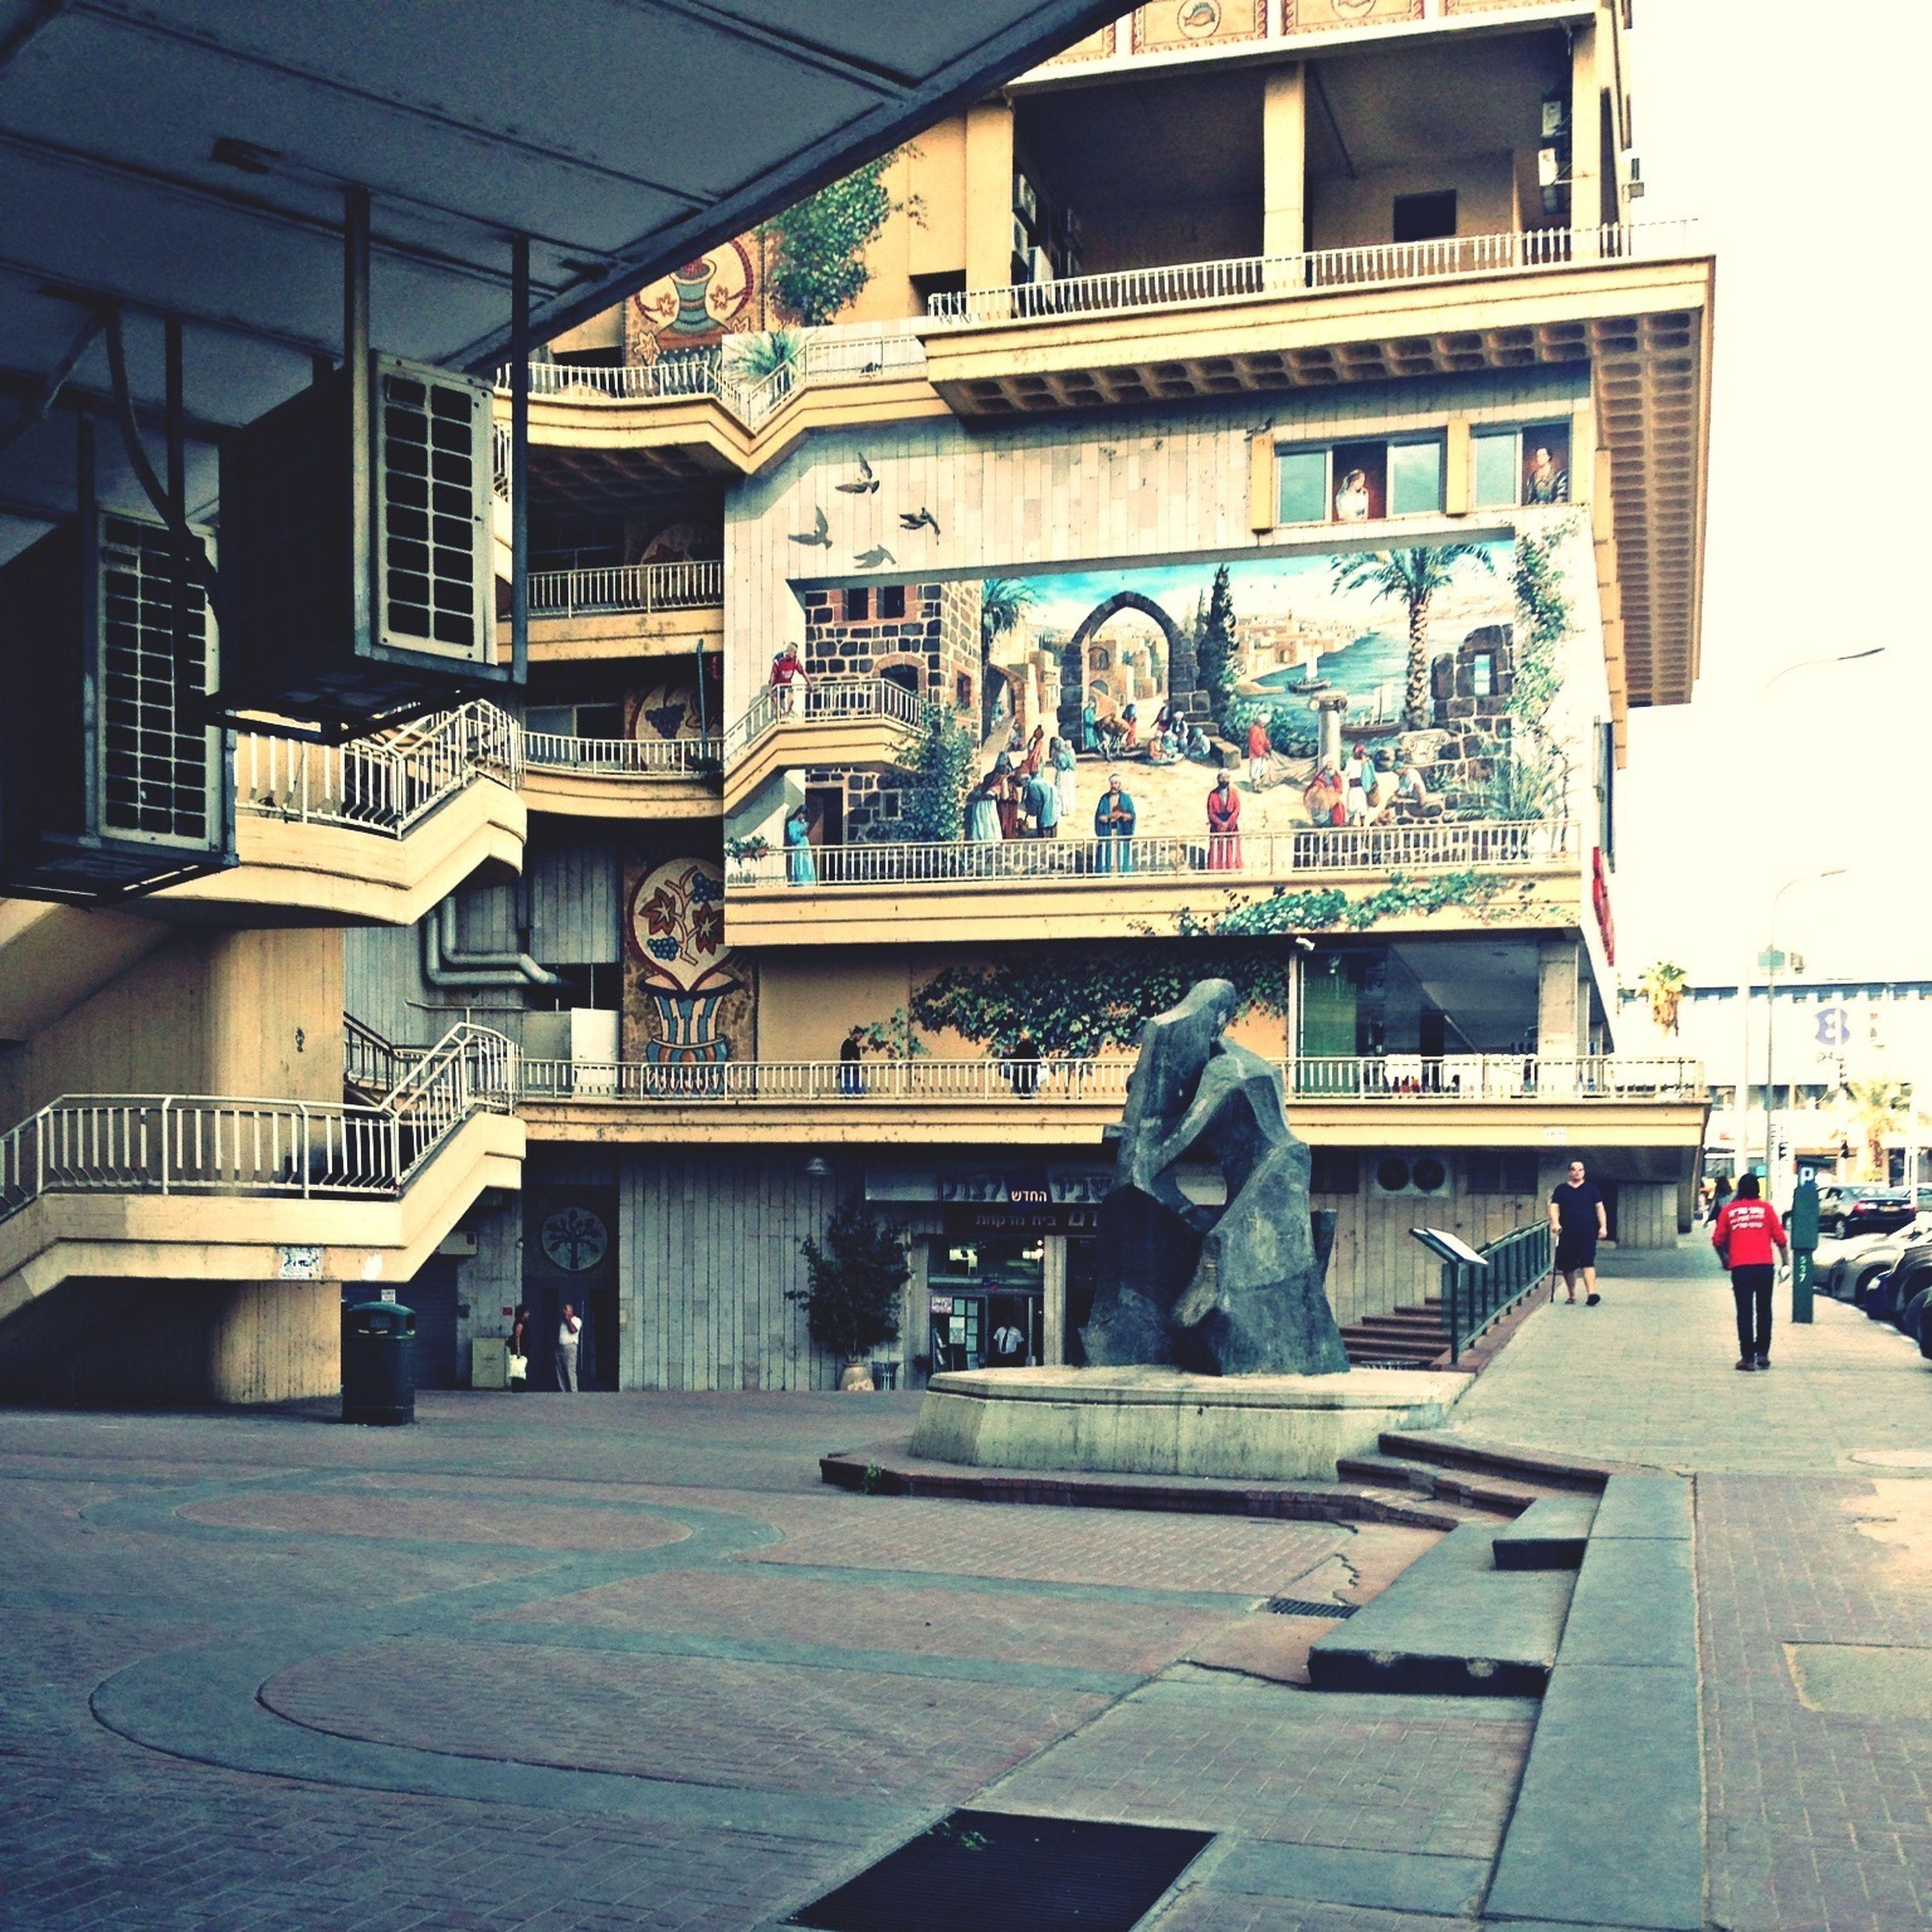 architecture, built structure, building exterior, art, art and craft, human representation, men, creativity, building, city, lifestyles, sculpture, statue, person, day, leisure activity, city life, outdoors